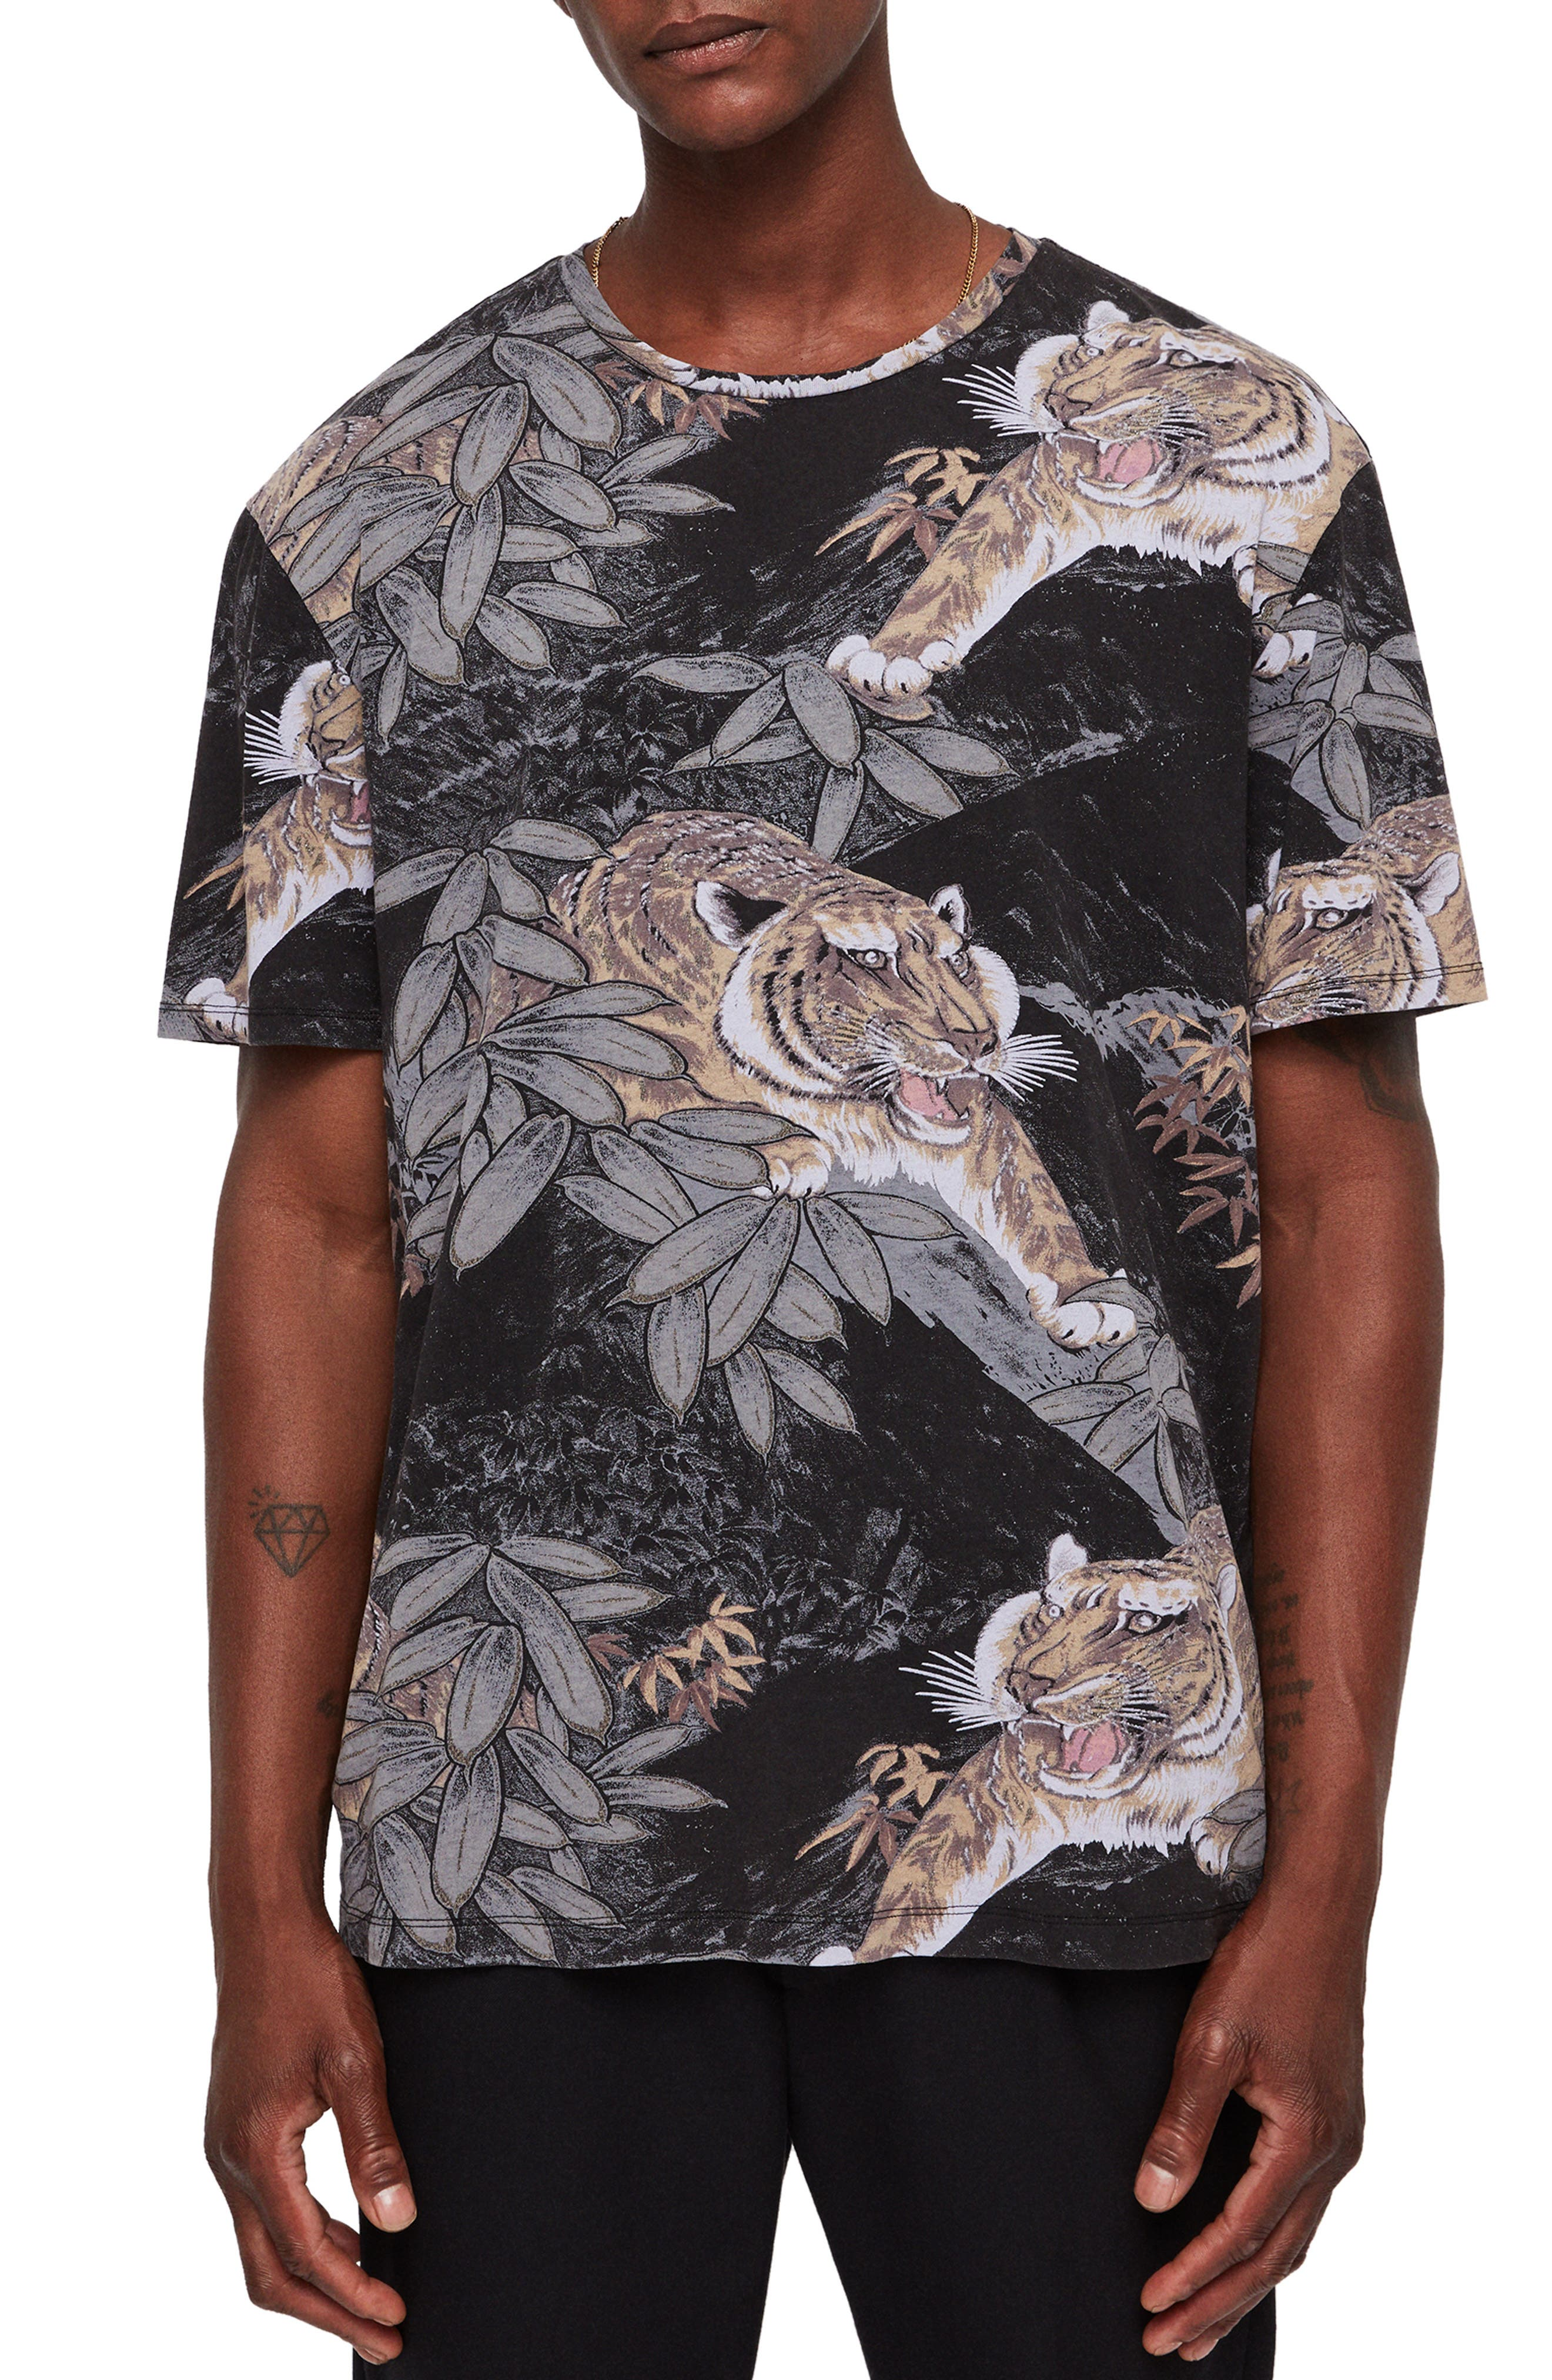 Chokai Slim Fit T-Shirt,                             Main thumbnail 1, color,                             004